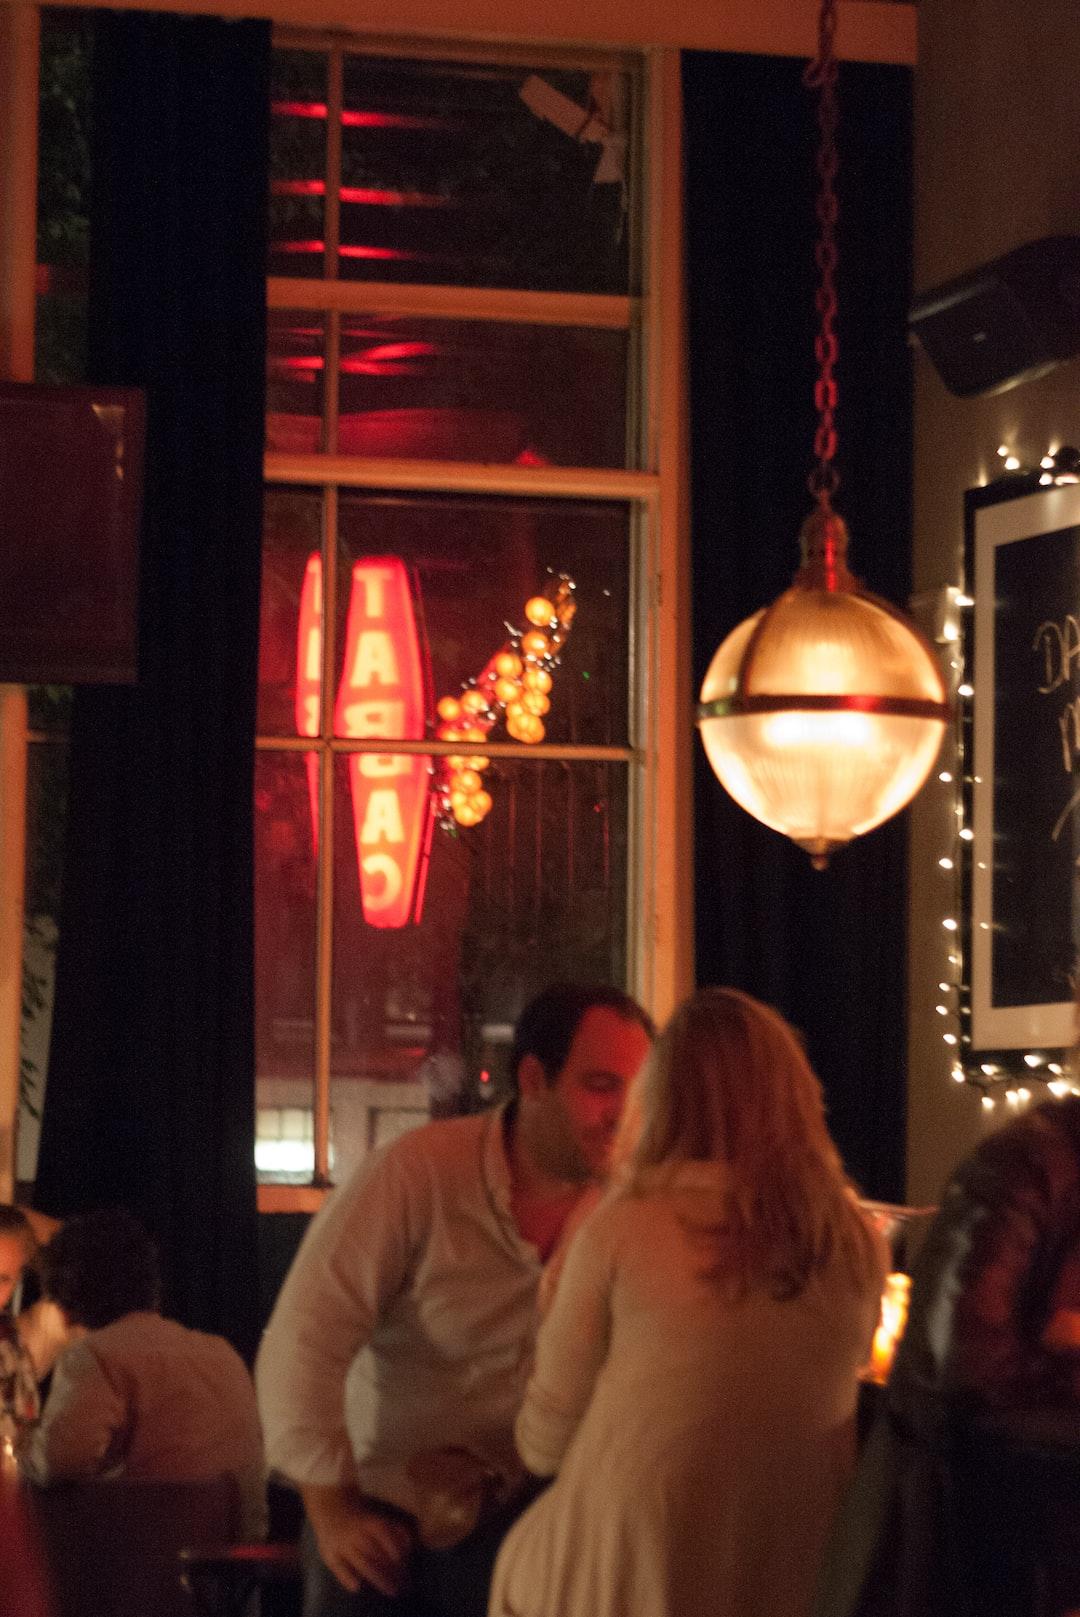 Conversation in Café Tabac